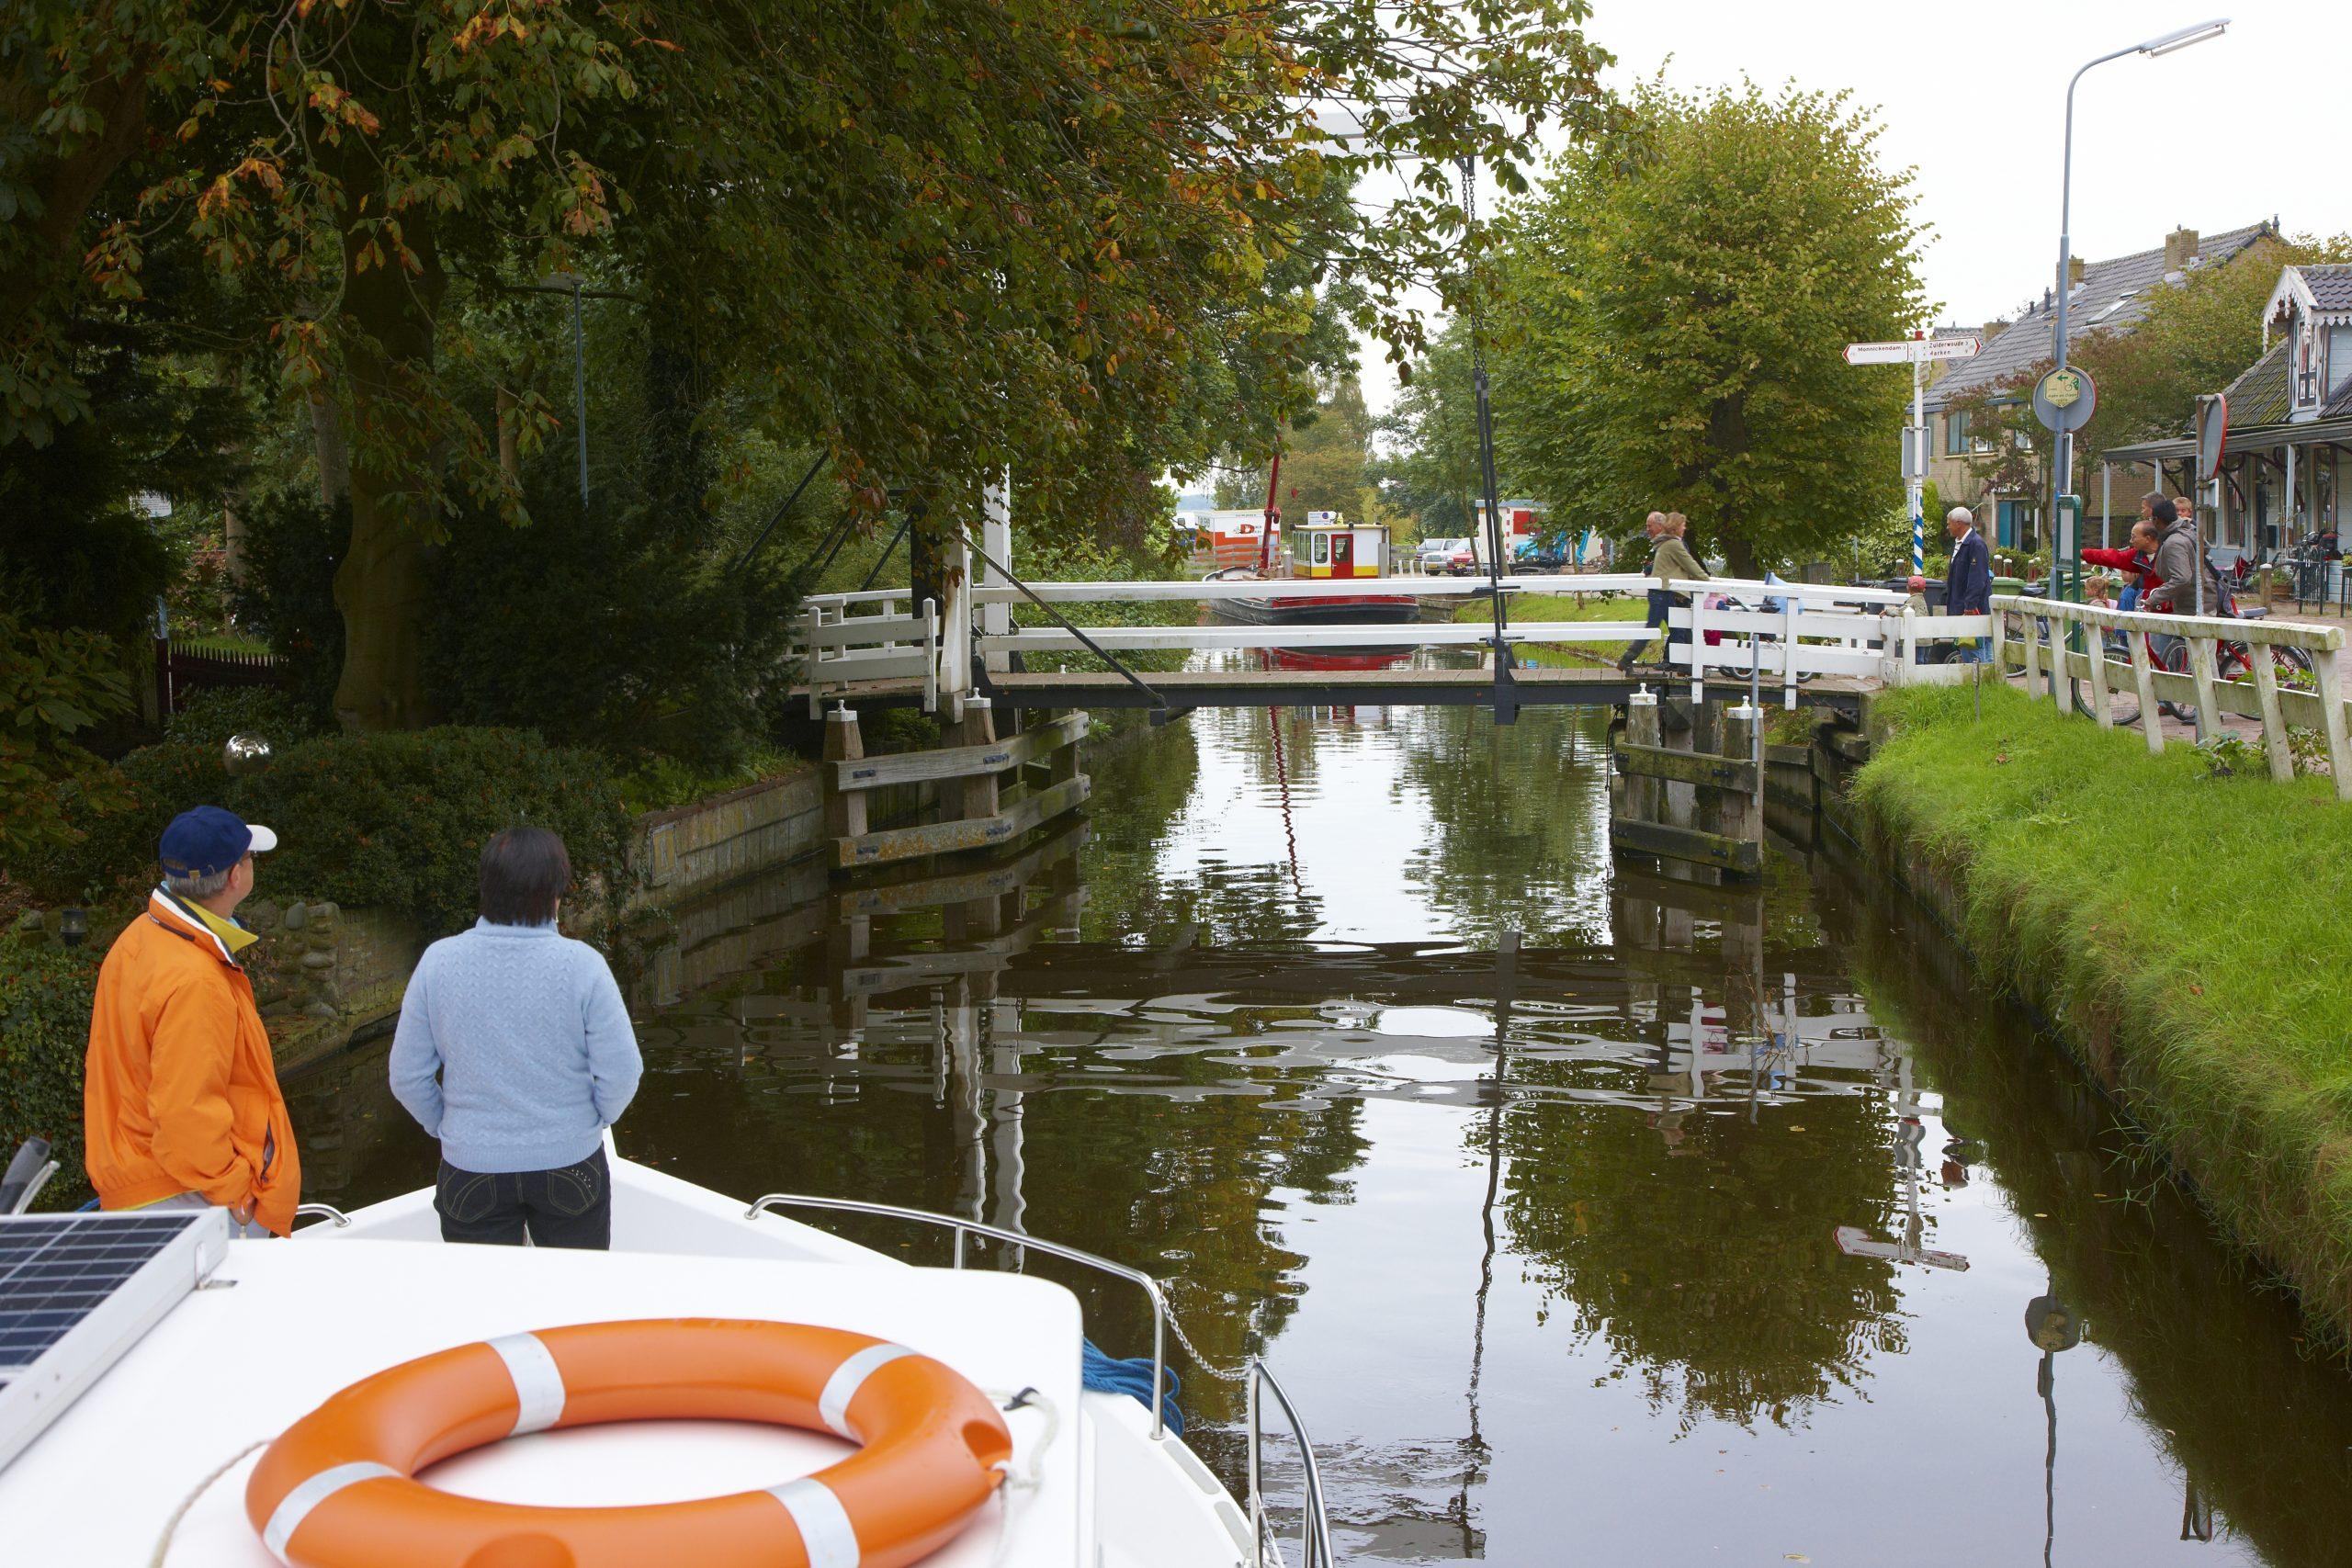 Hauseboot urlaub Holland